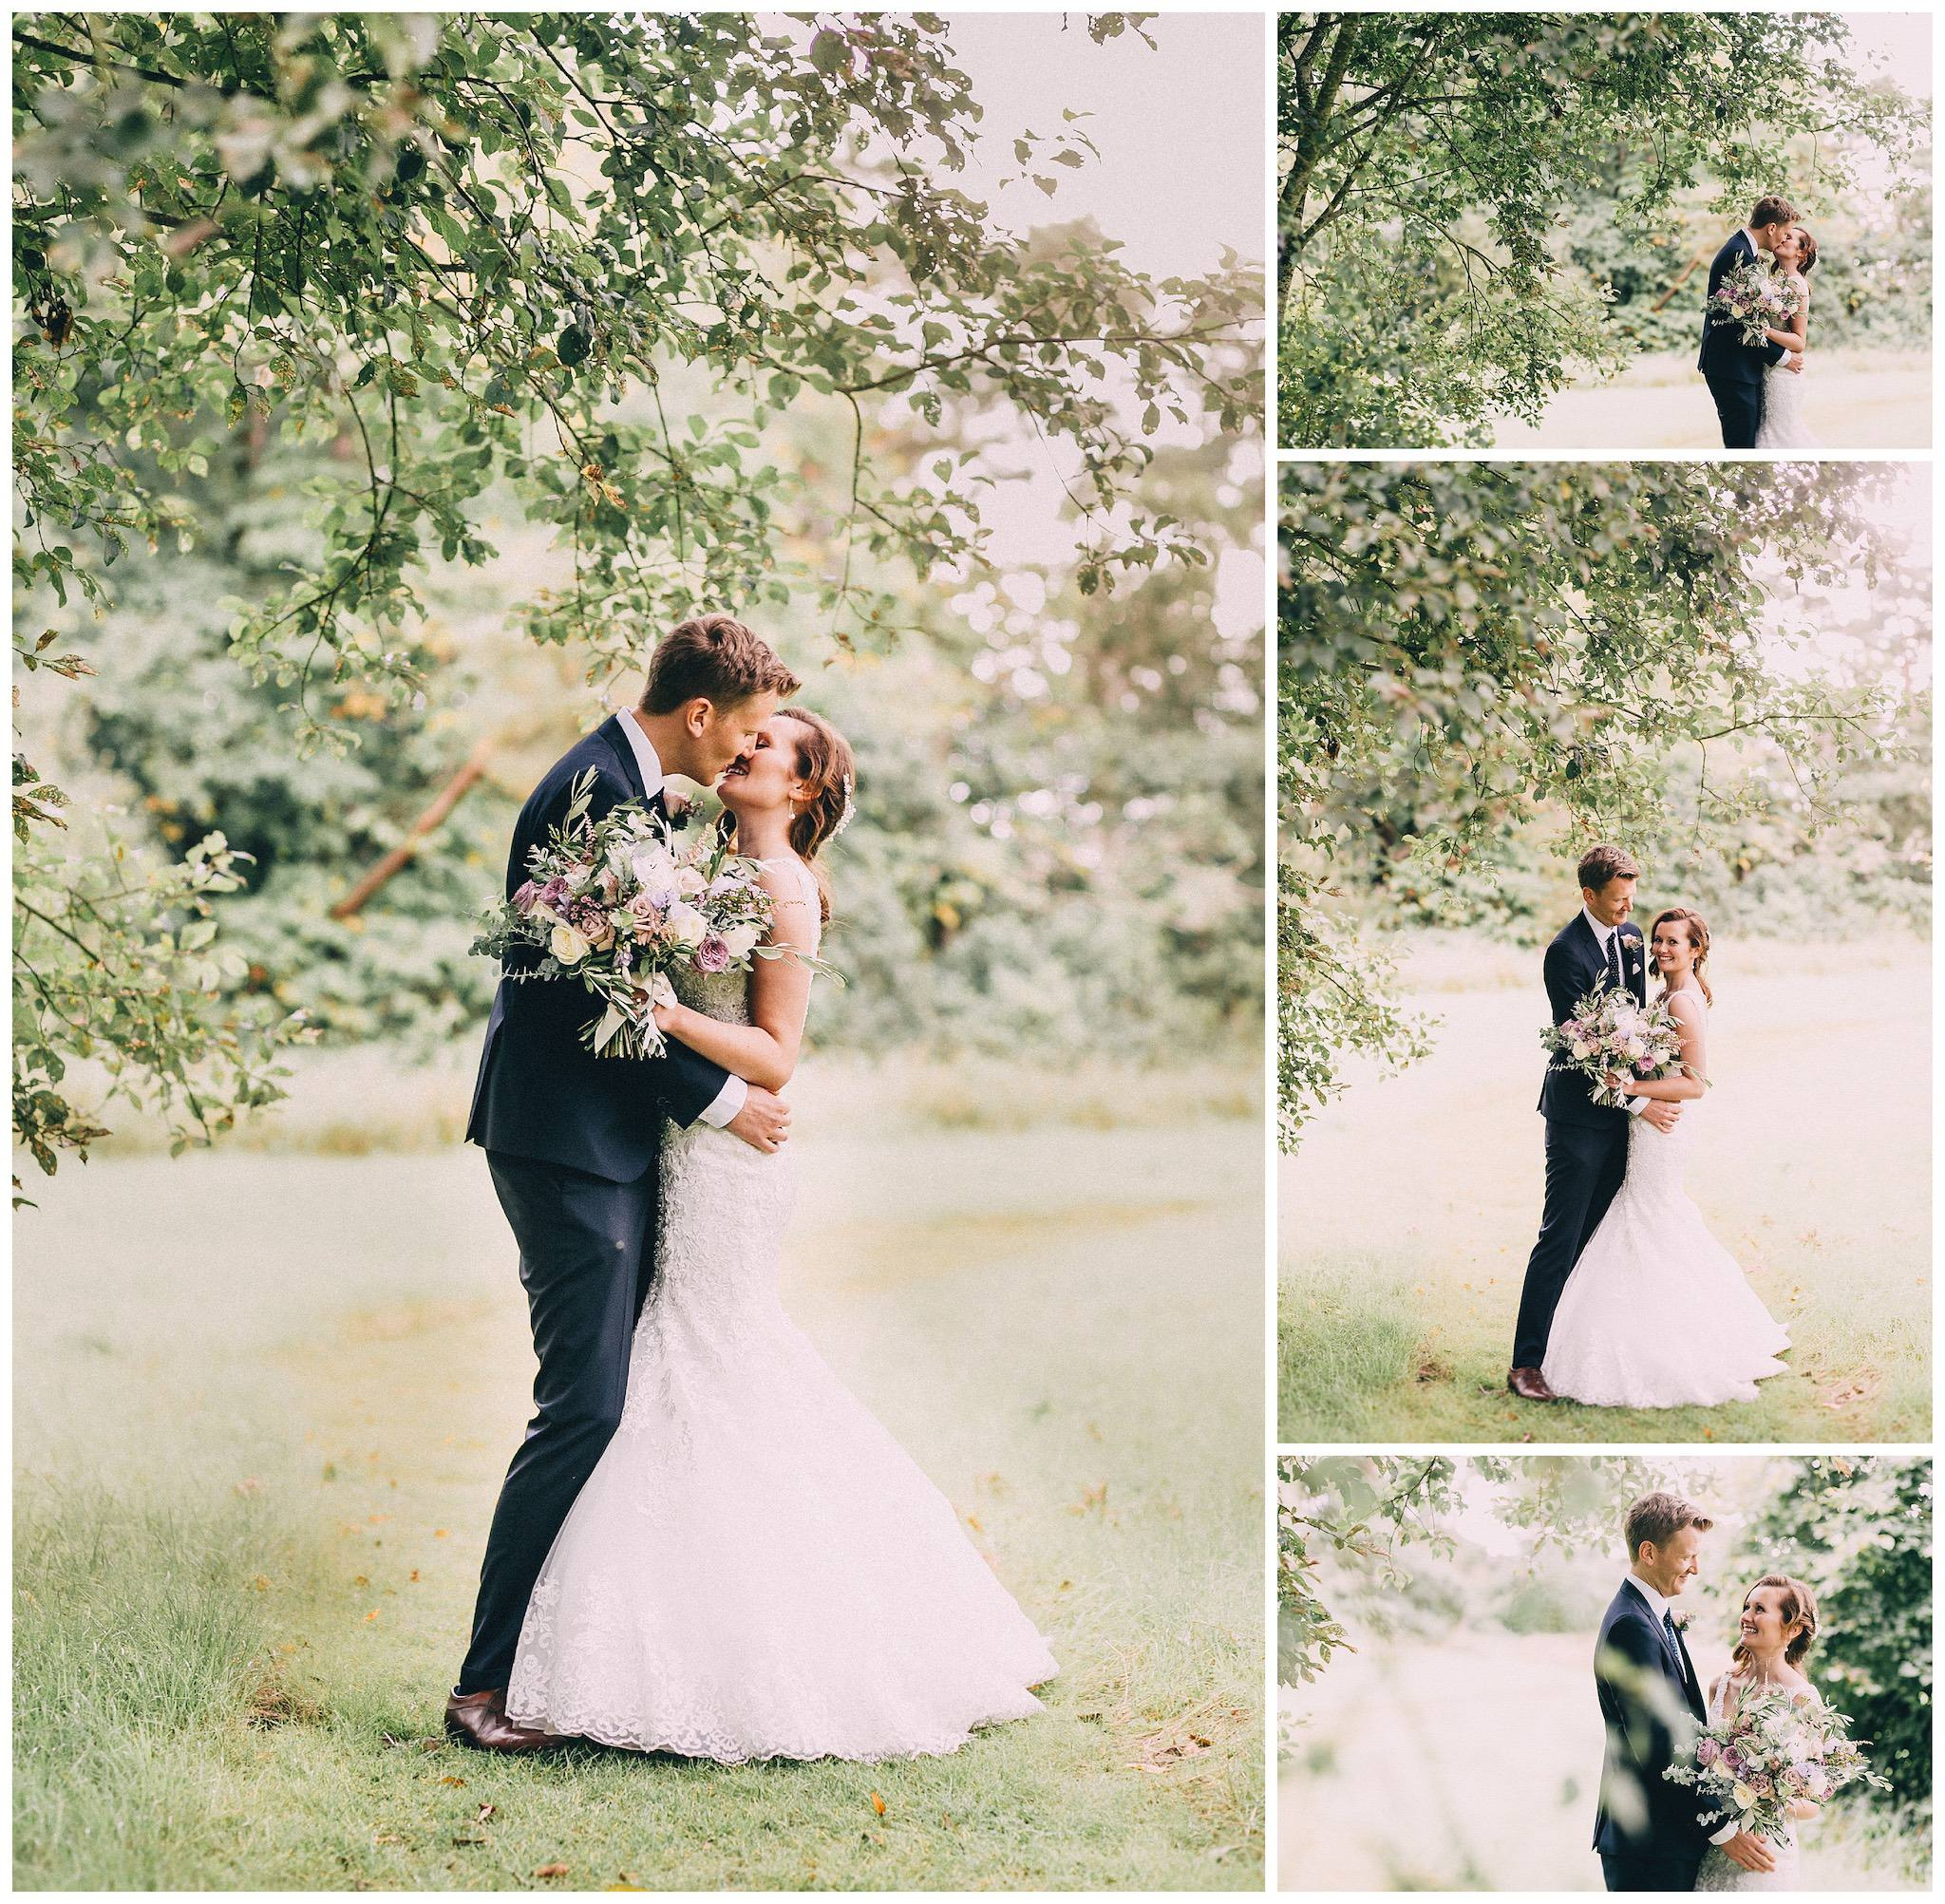 Le-Petit-Chateau-Wedding-Photographer-19.jpg